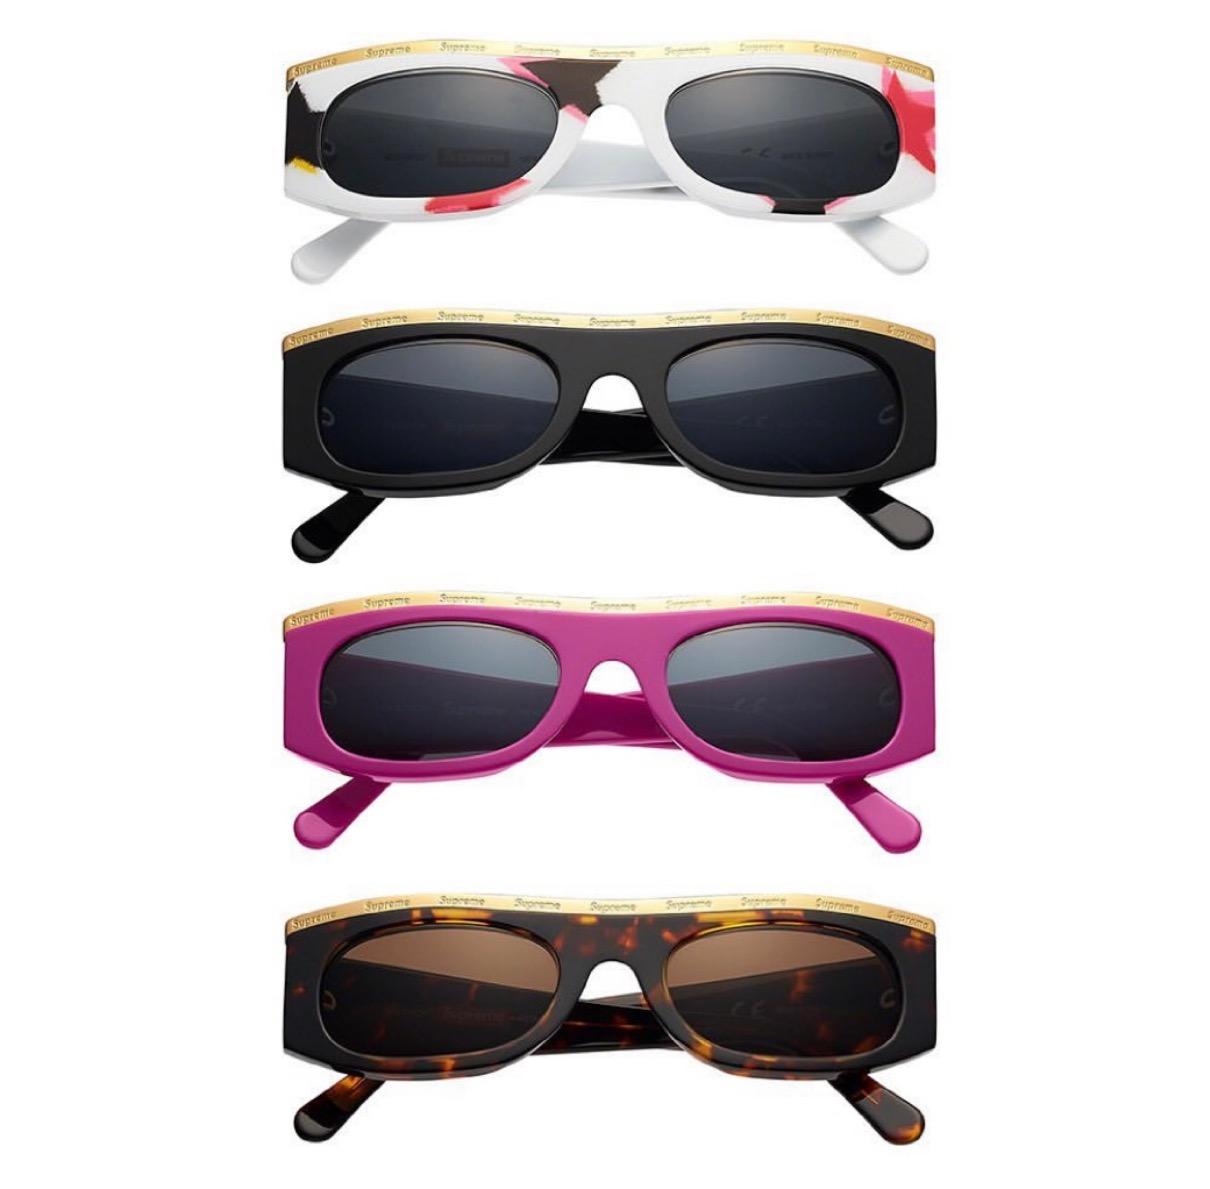 upreme 2021ss シュプリーム 2021春夏 week 17 Goldtop Sunglasses